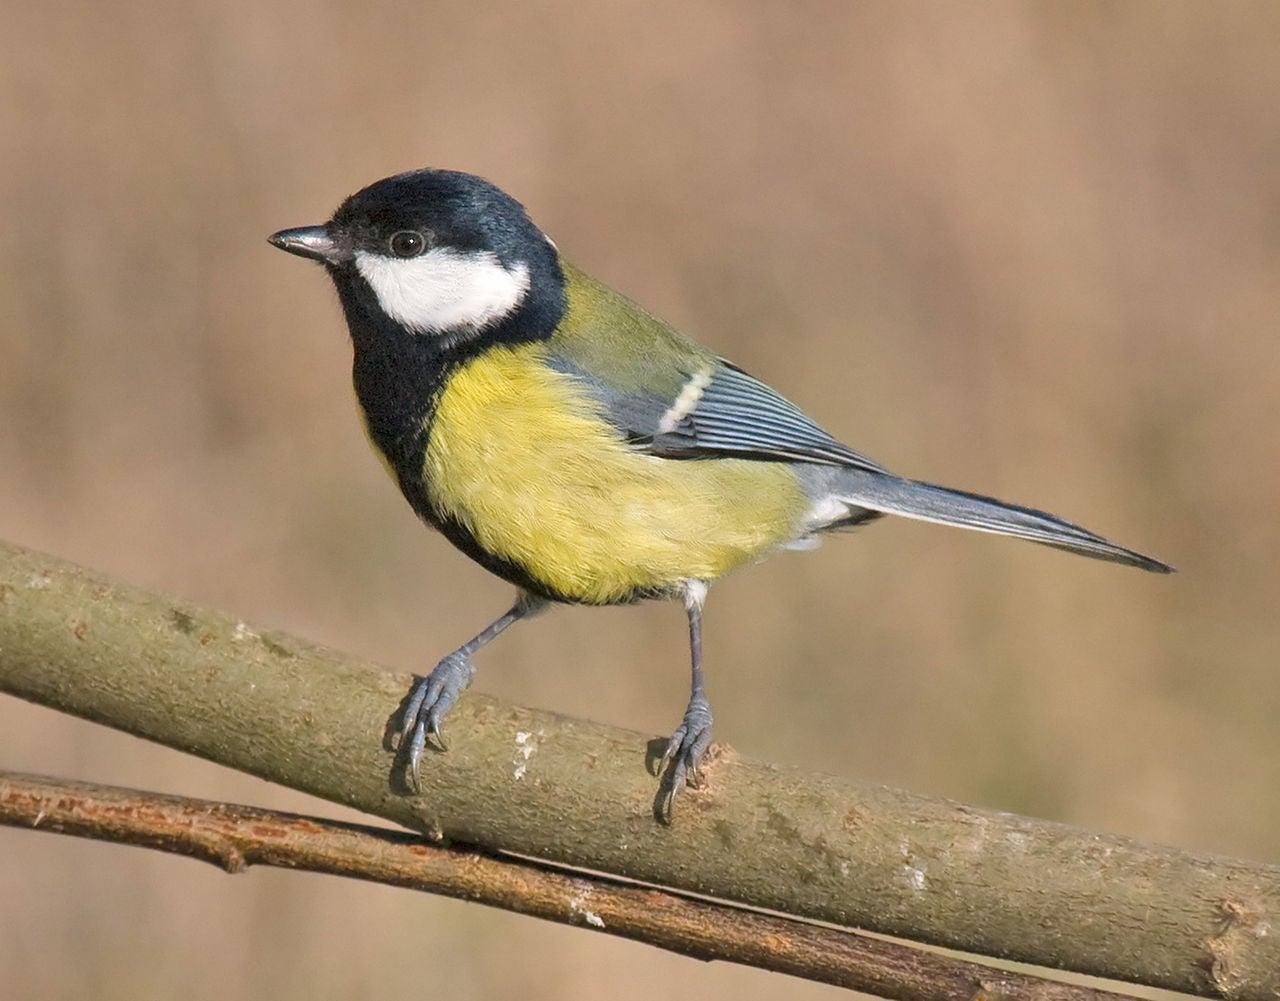 City Living May Shorten Some Birds' Natural Lifespans